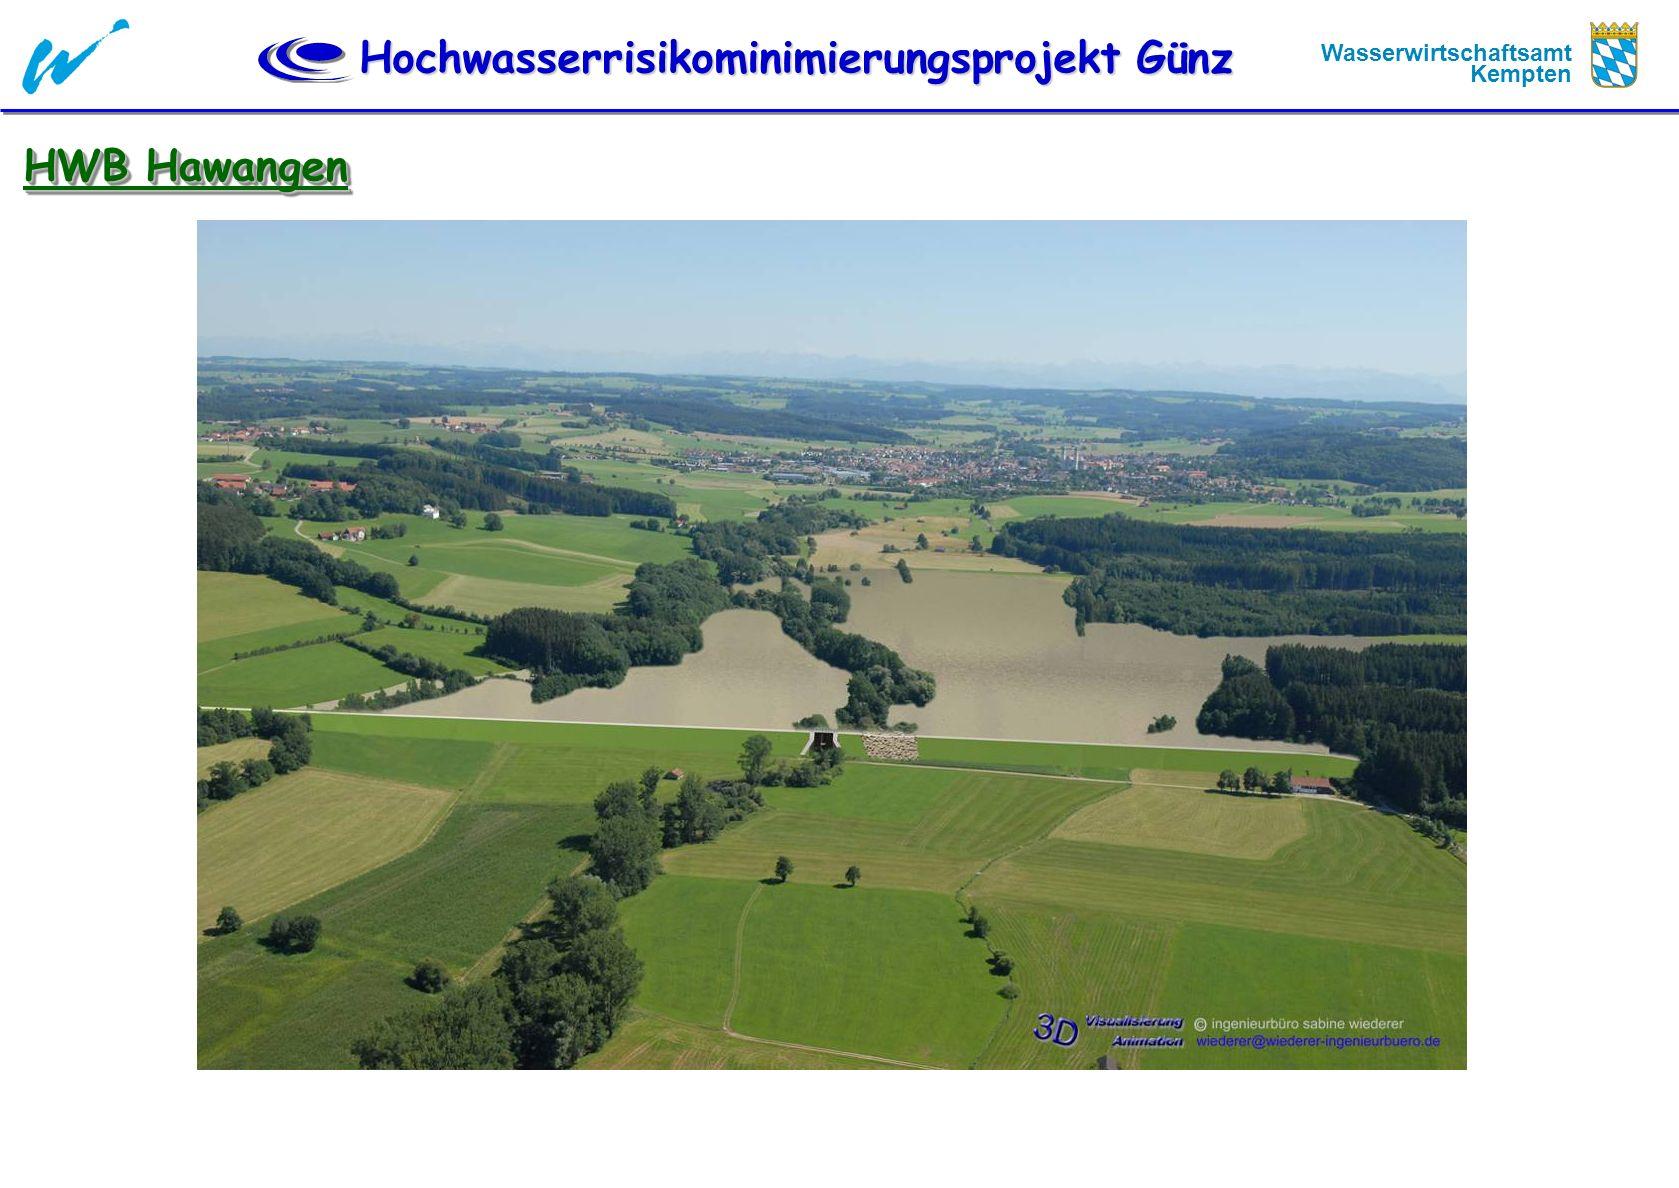 Hochwasserrisikominimierungsprojekt Günz Wasserwirtschaftsamt Kempten HWB Hawangen